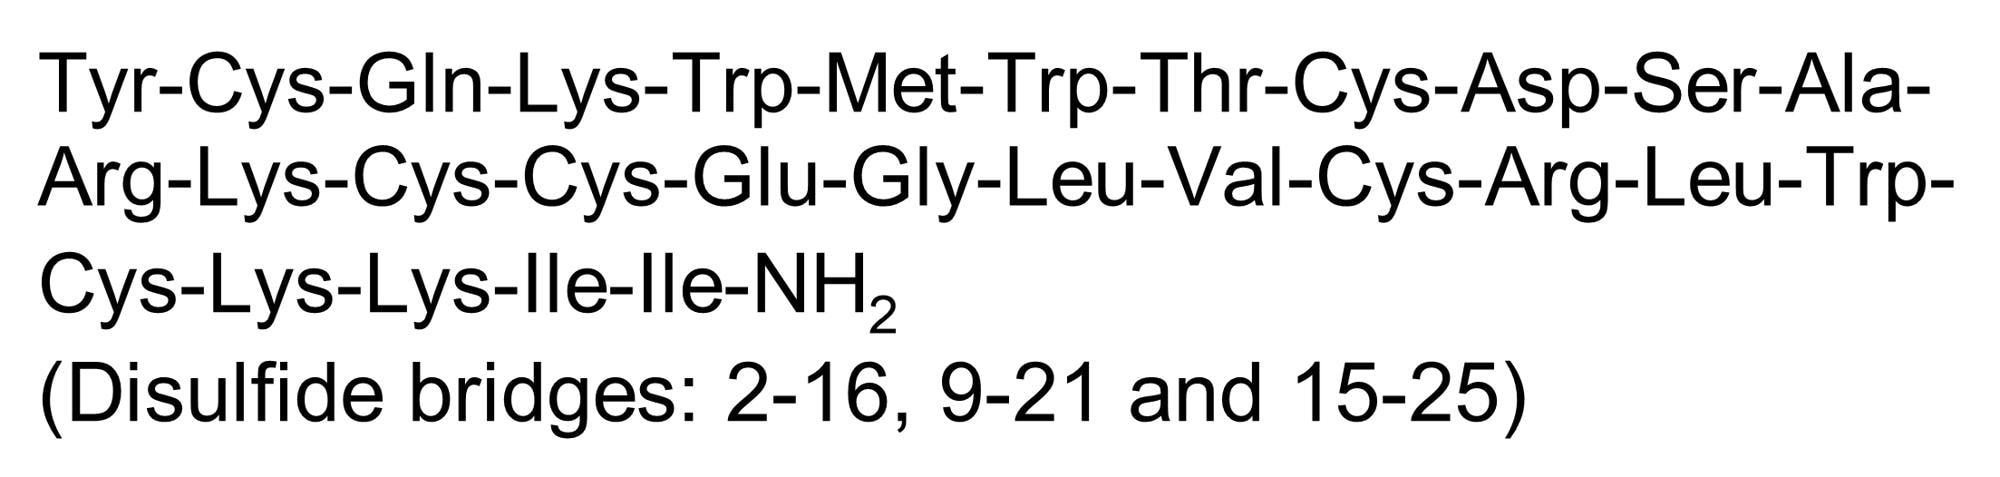 Chemical Structure - Phrixotoxin-1, Specific K<sub>v4.3</sub> and K<sub>v4.2</sub> channel blocker (ab141844)